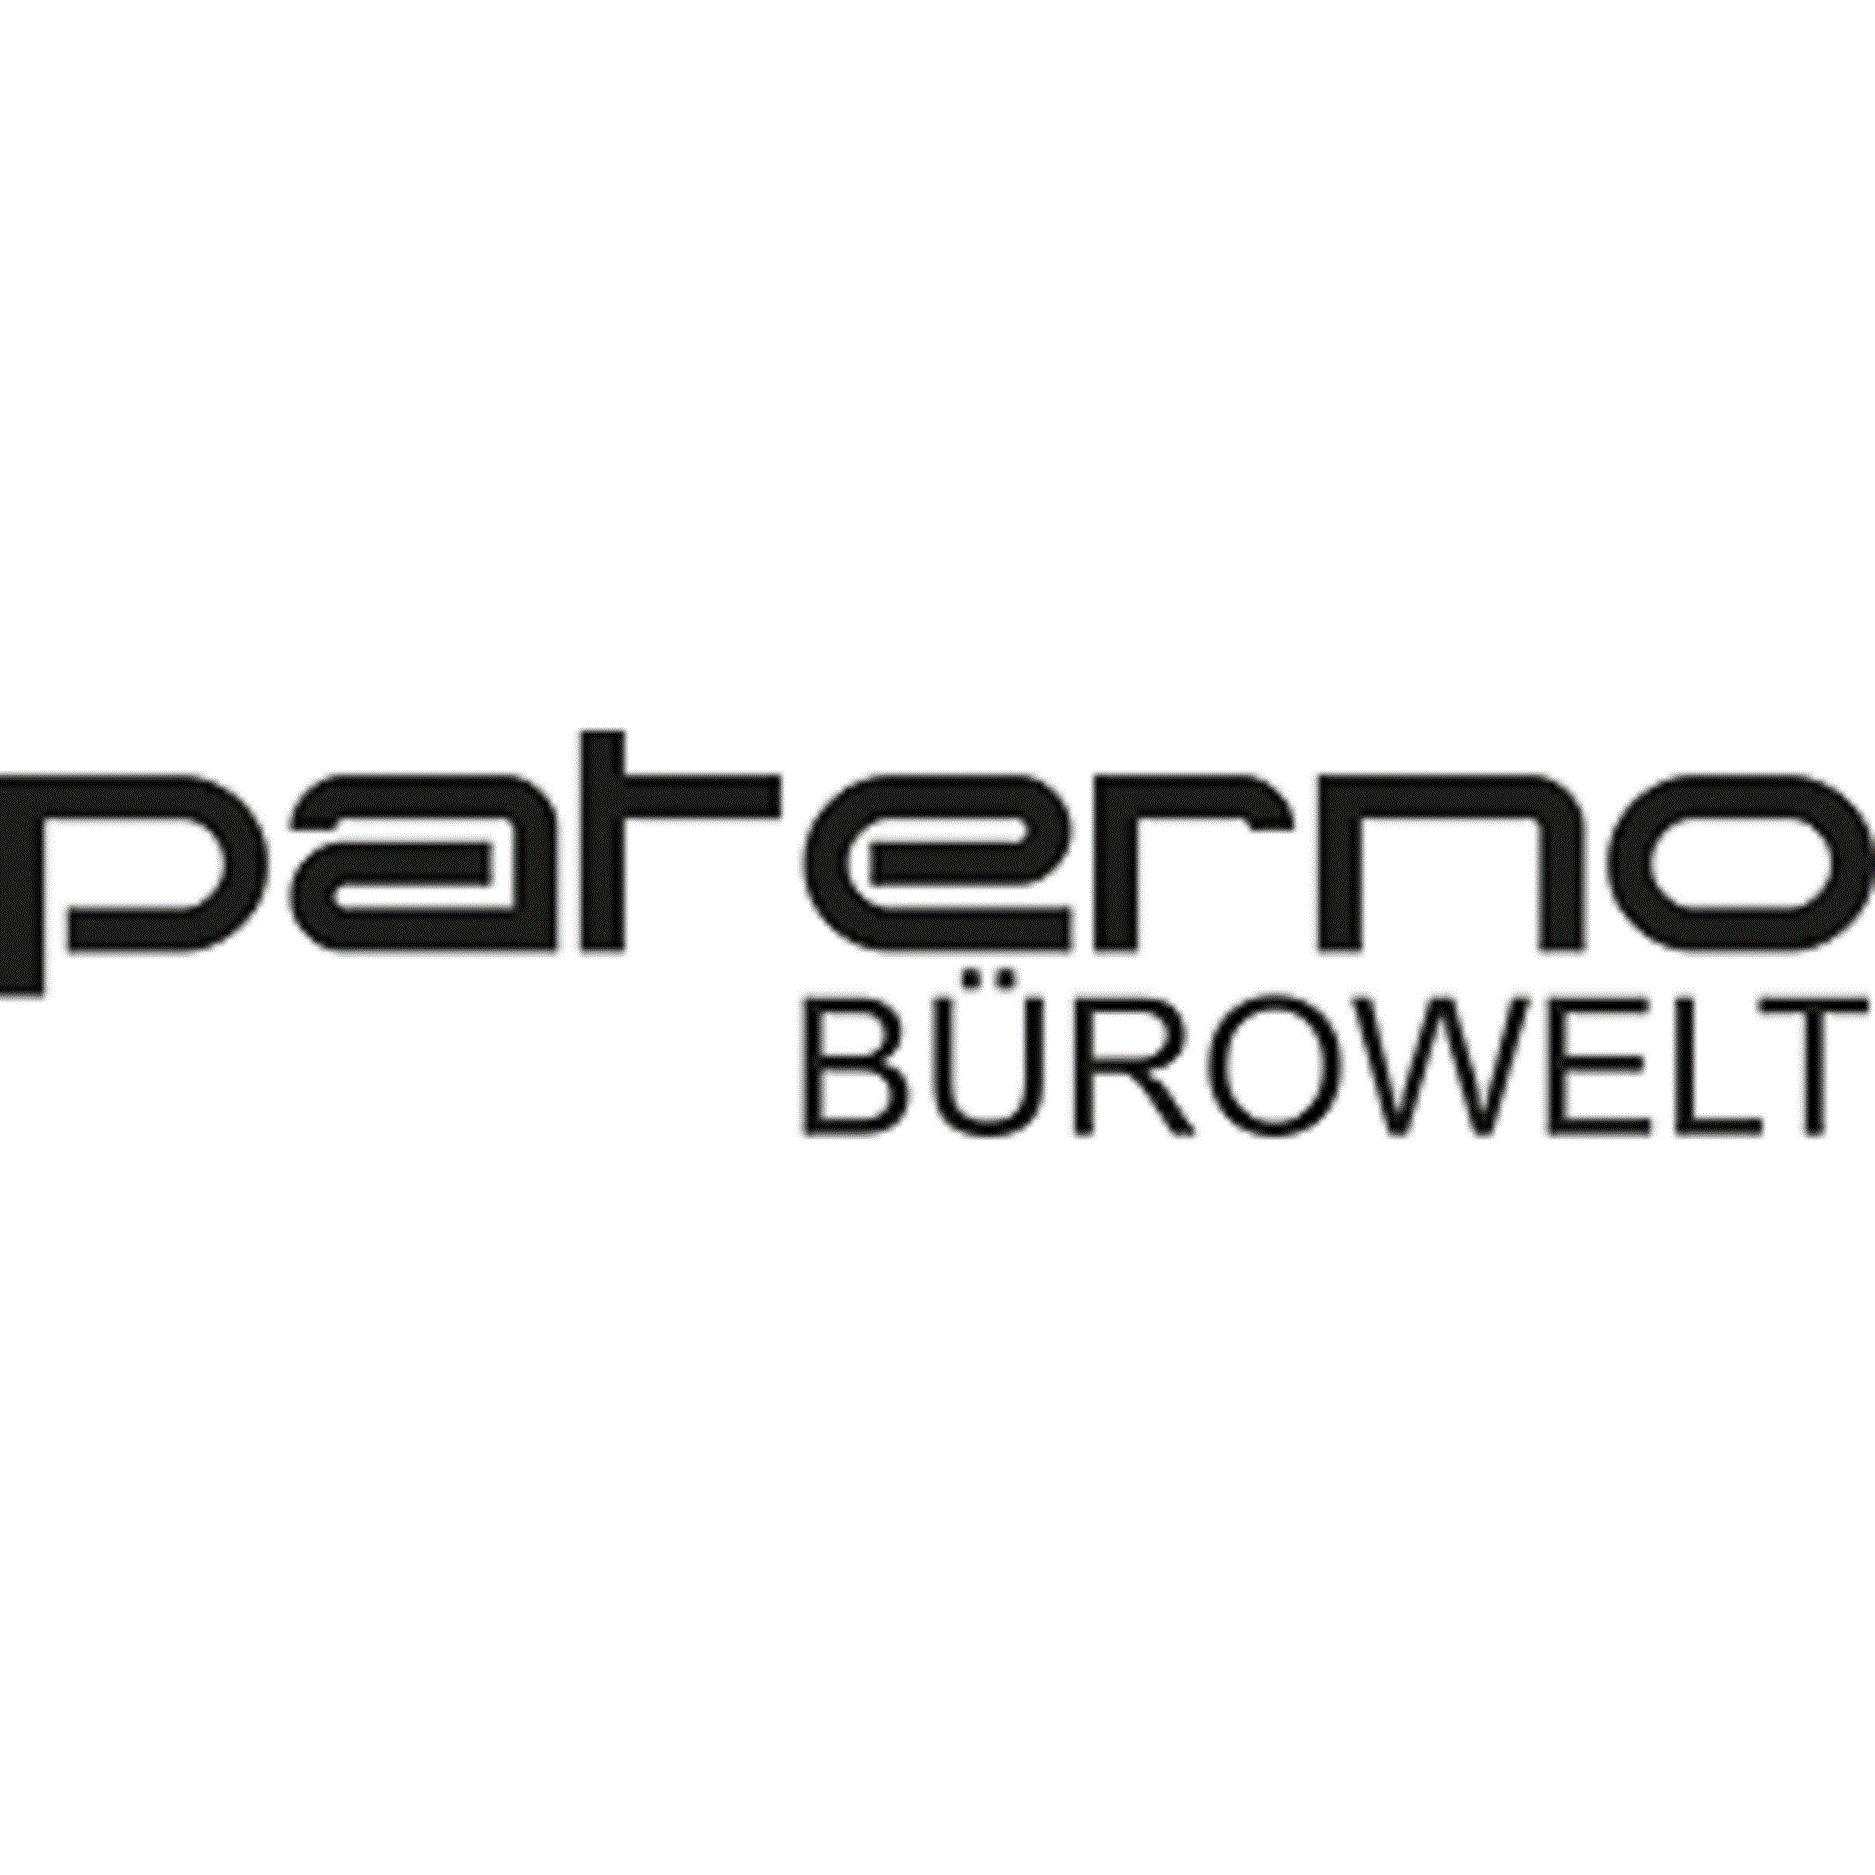 Paterno Bürowelt GmbH & Co KG